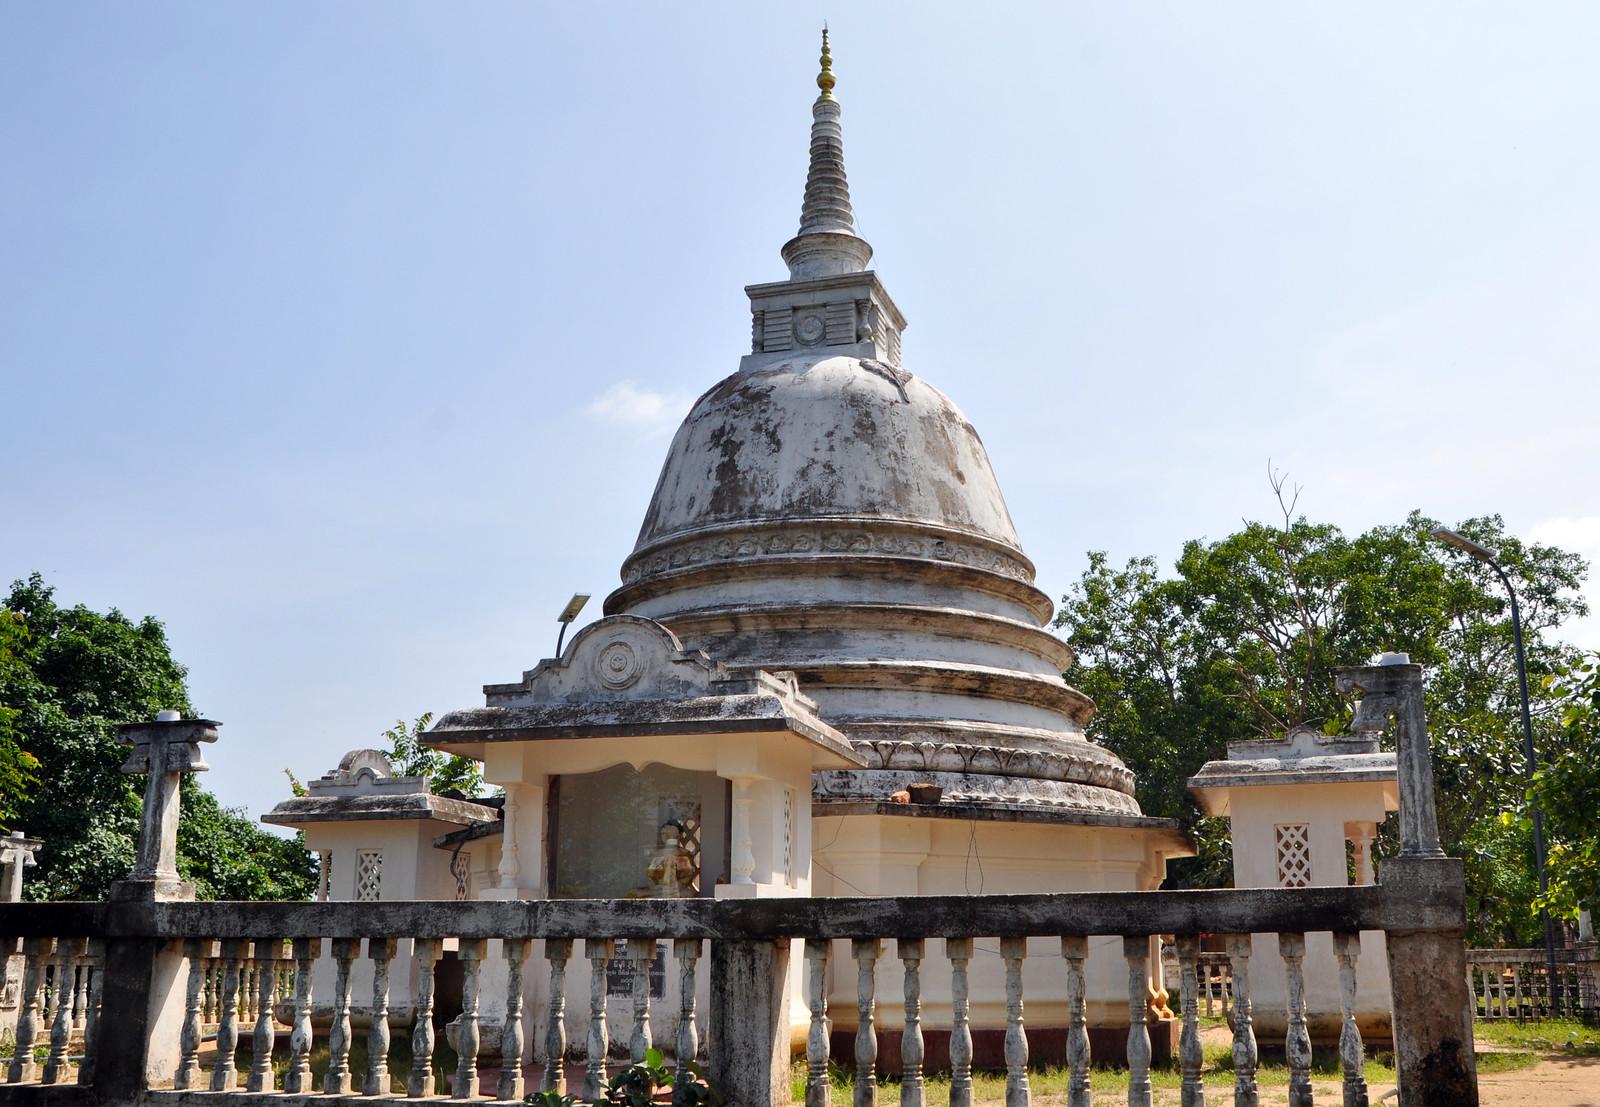 Aukana, la estatua de Buda más alta de Sri Lanka buda de aukana - 46728891602 95fa93fcc5 h - Buda de Aukana, la estatua de Buda más alta de Sri Lanka